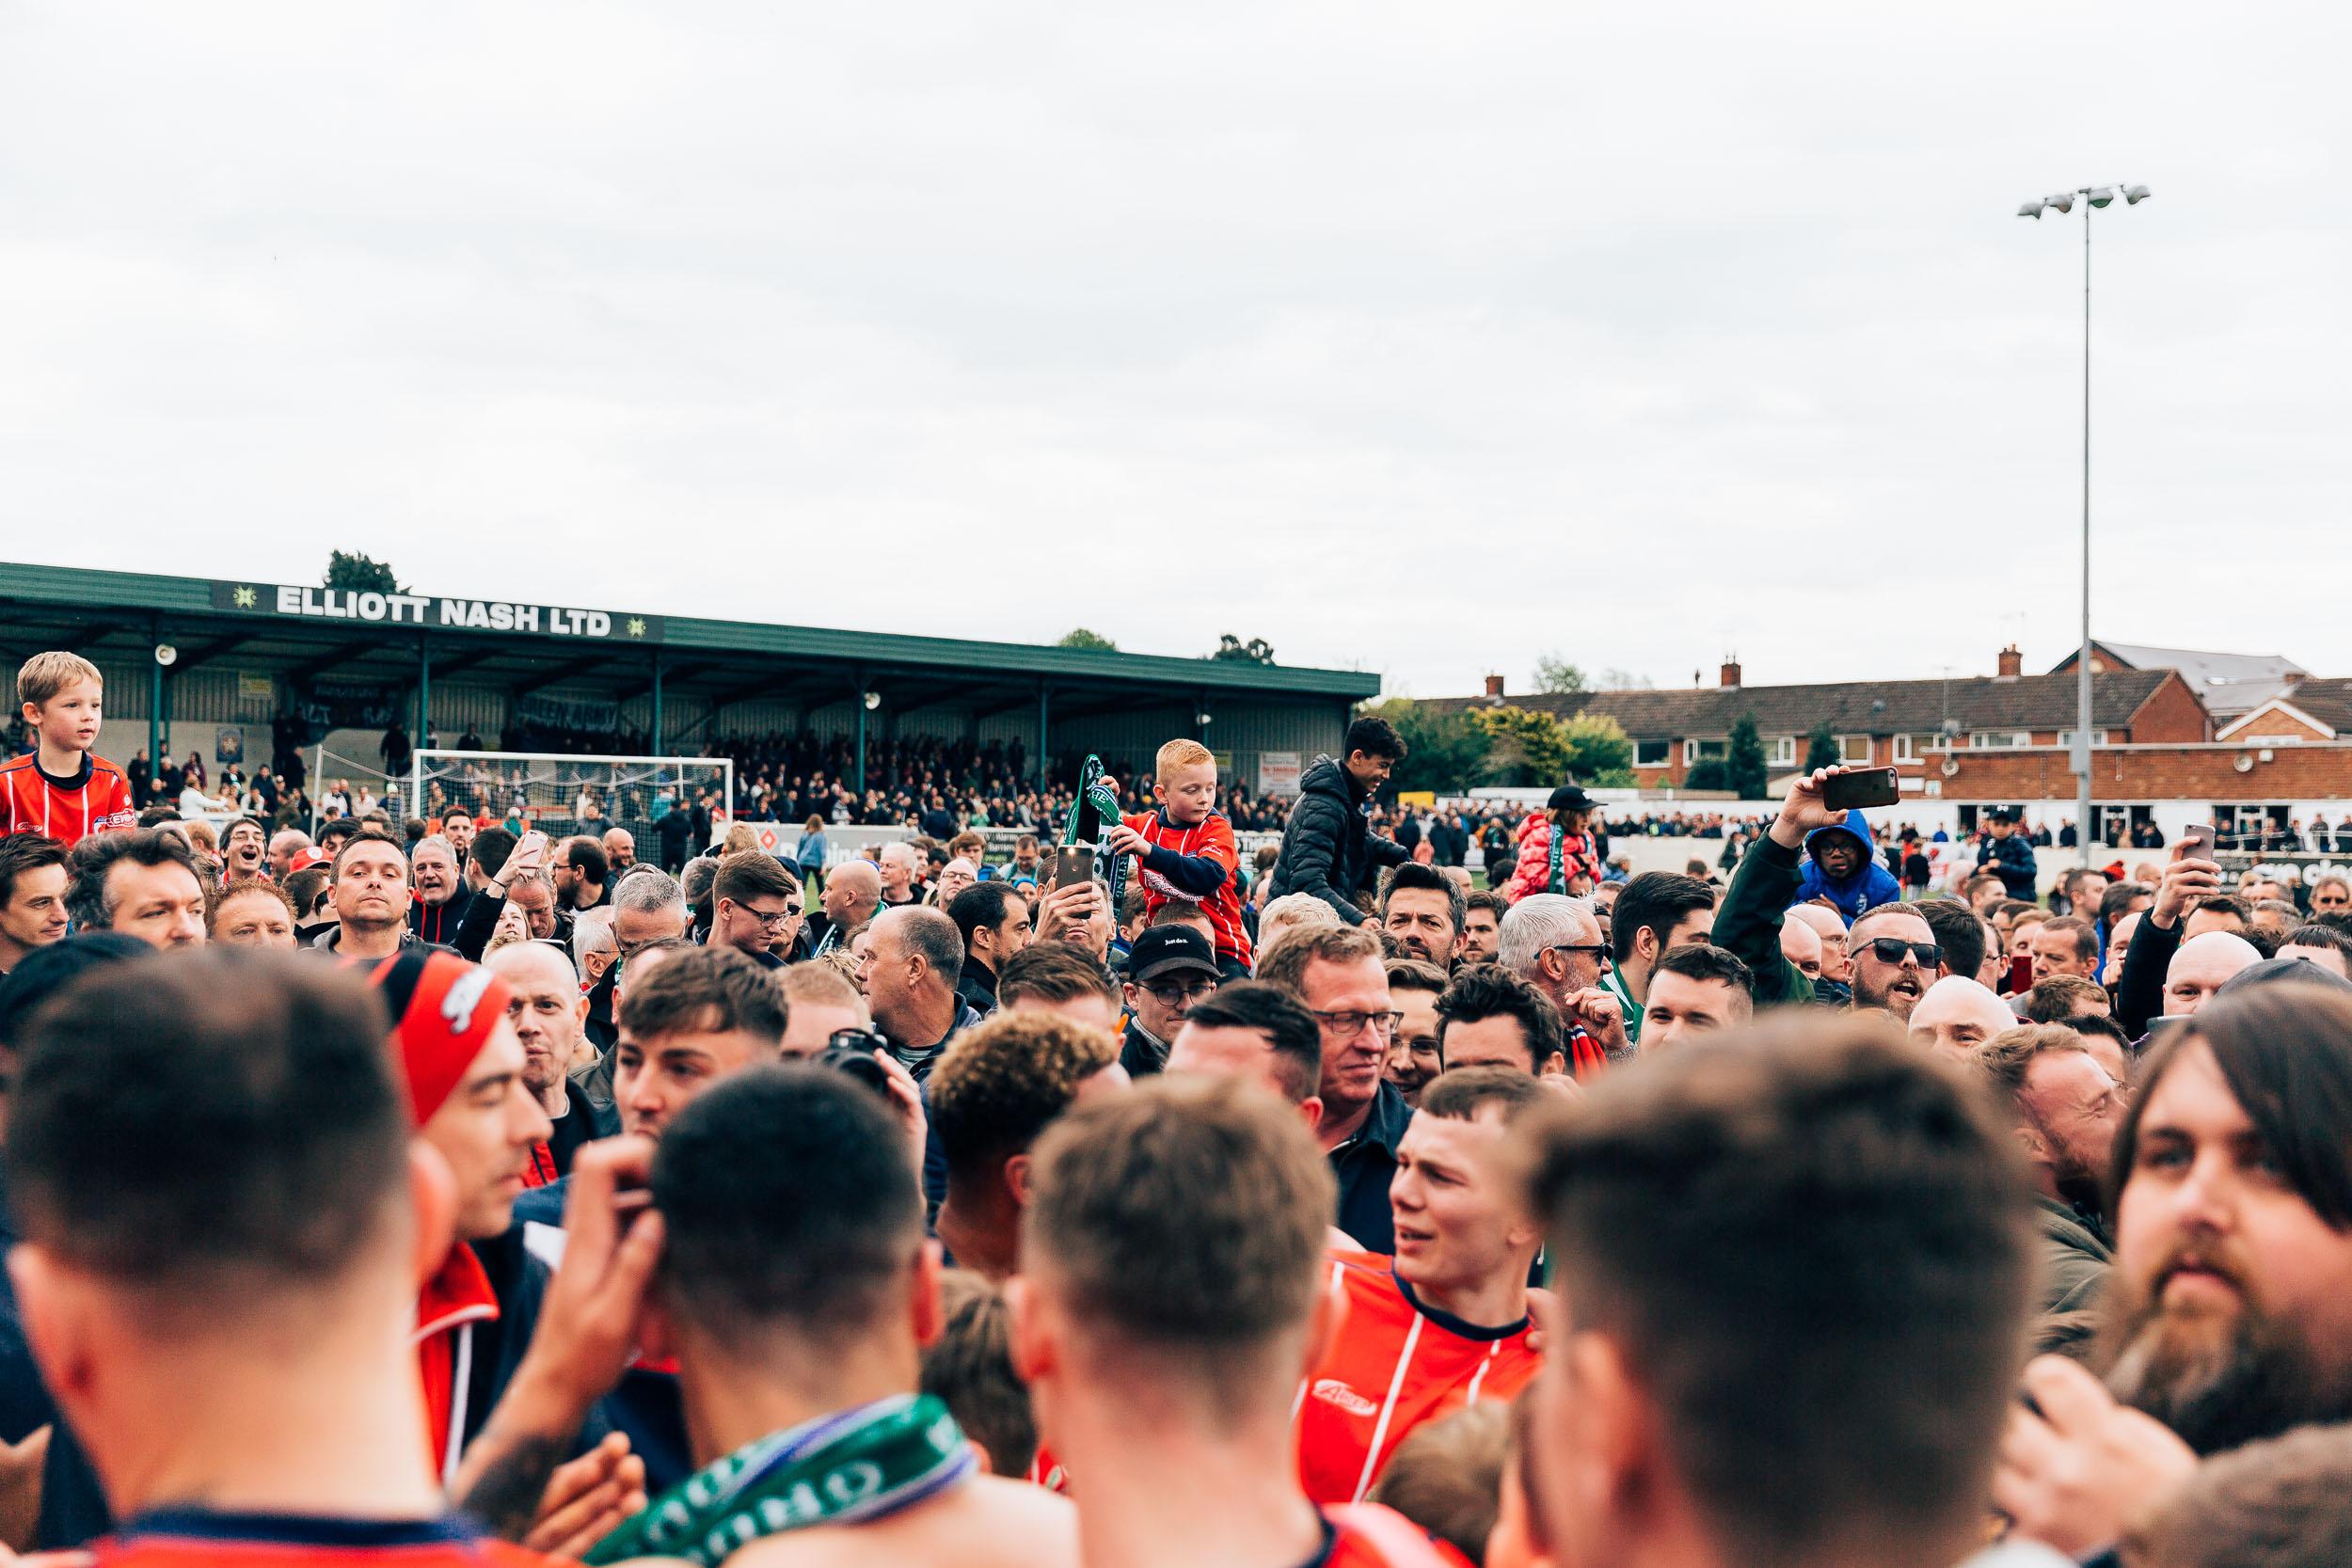 06_05_2019_Bromsgrove_Sporting_Corby-200.jpg